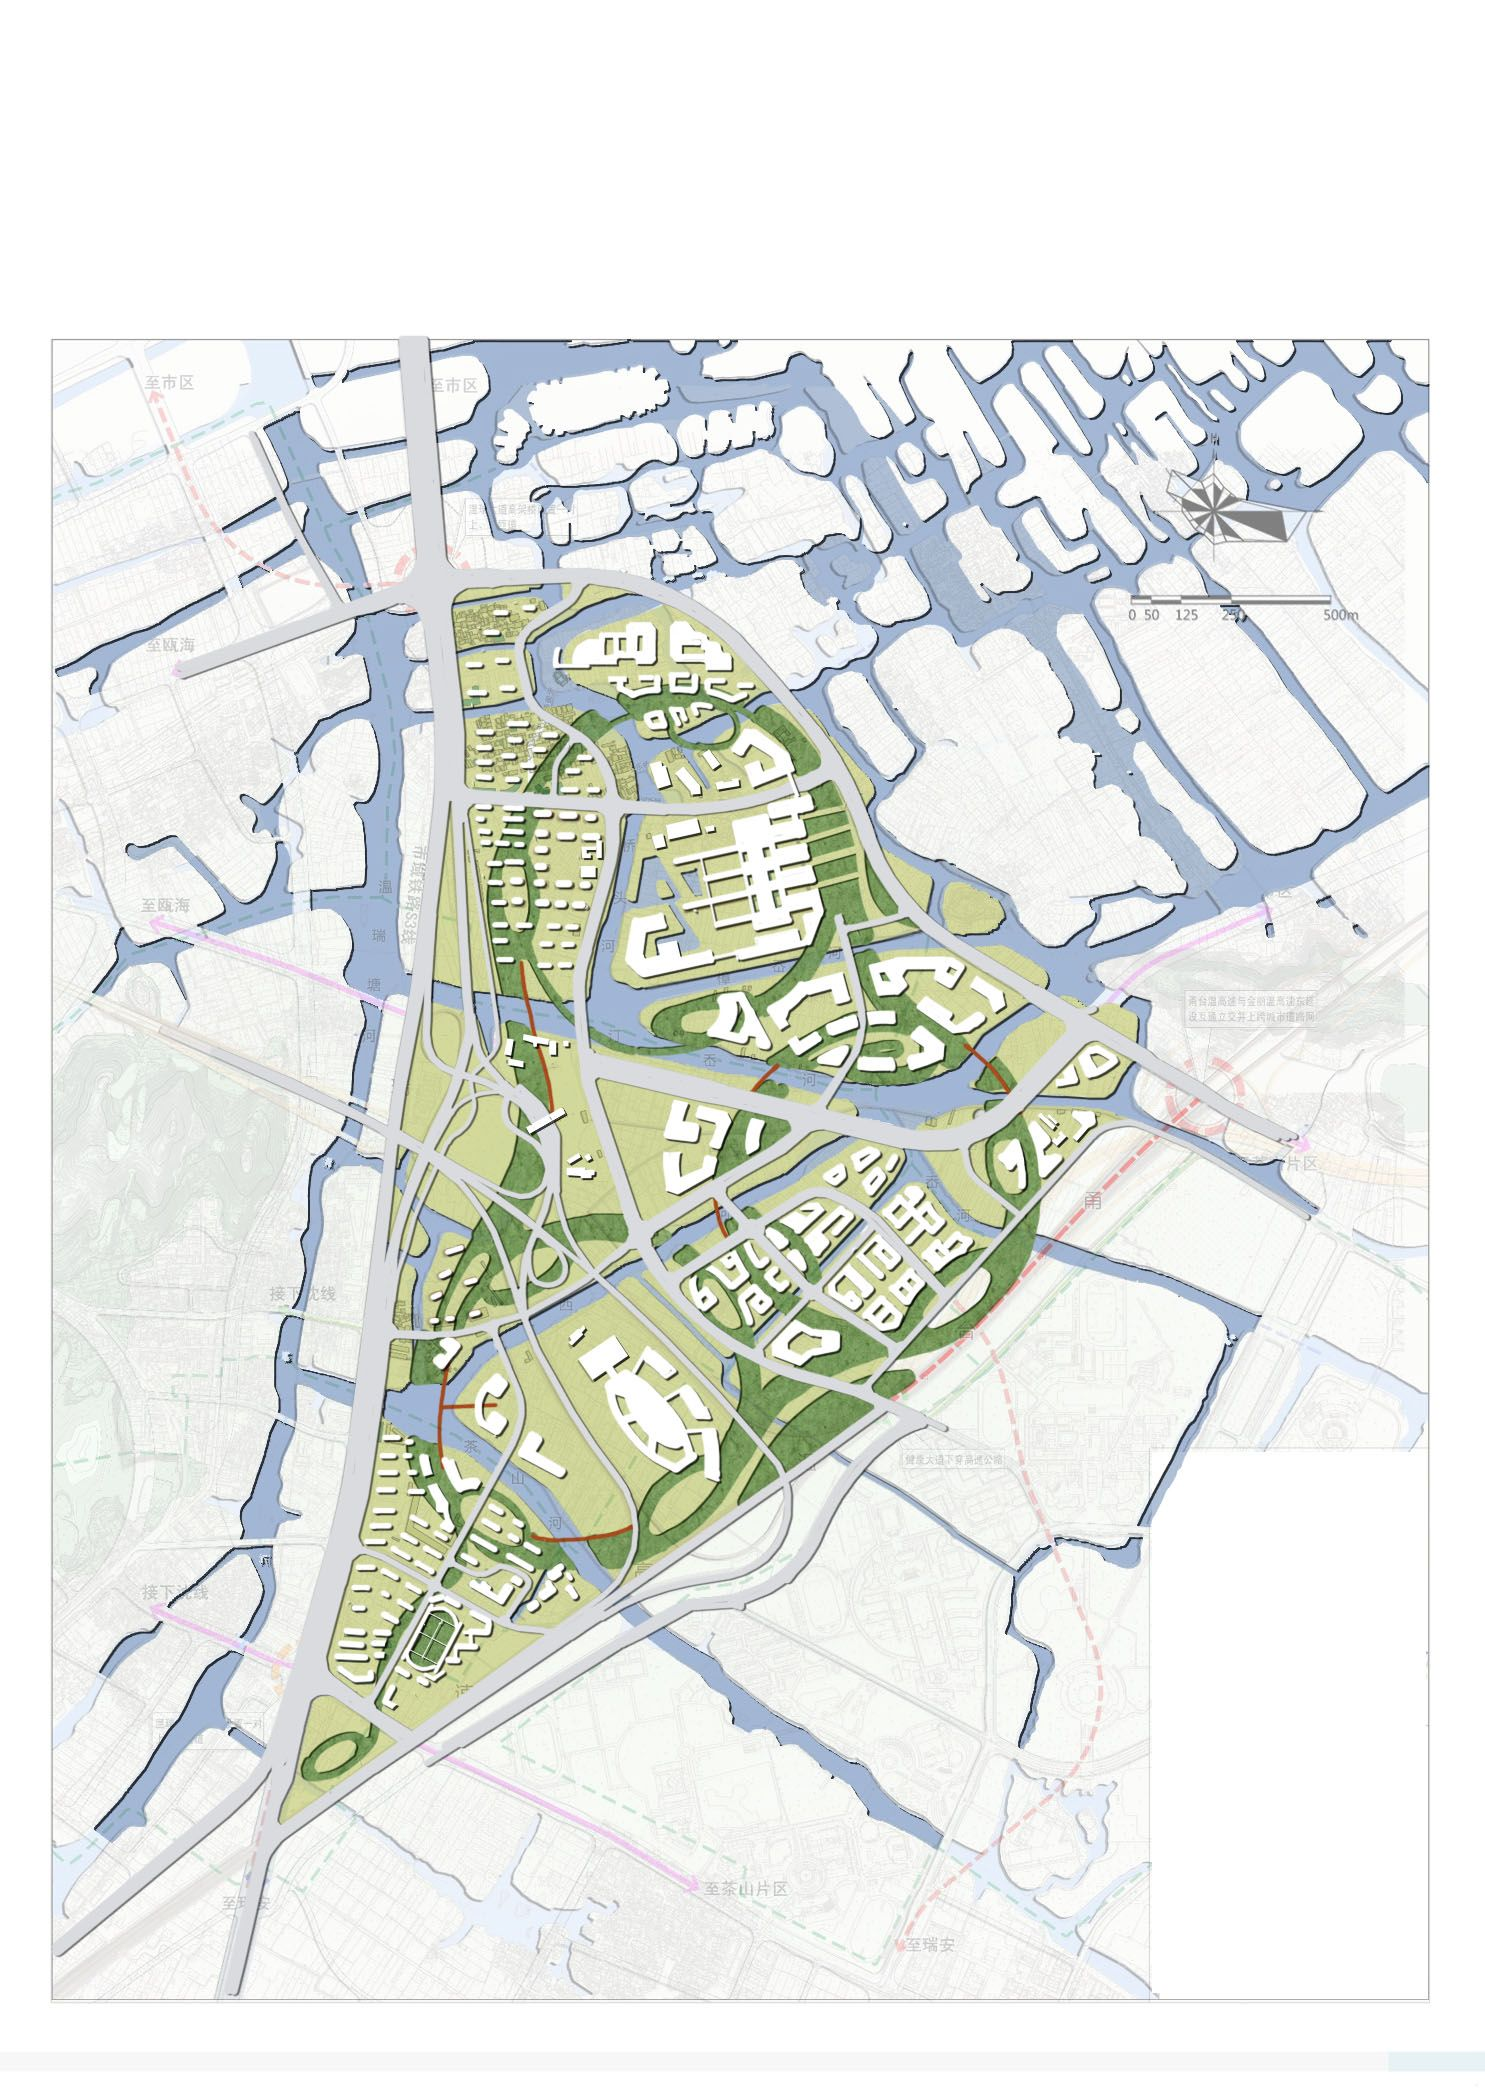 Andscape Masterplan Mixed Use Development Modern Landscape Urban Design Landscape Corridor And Entryw Urban Design Concept Urban Design Plan Urban Planning